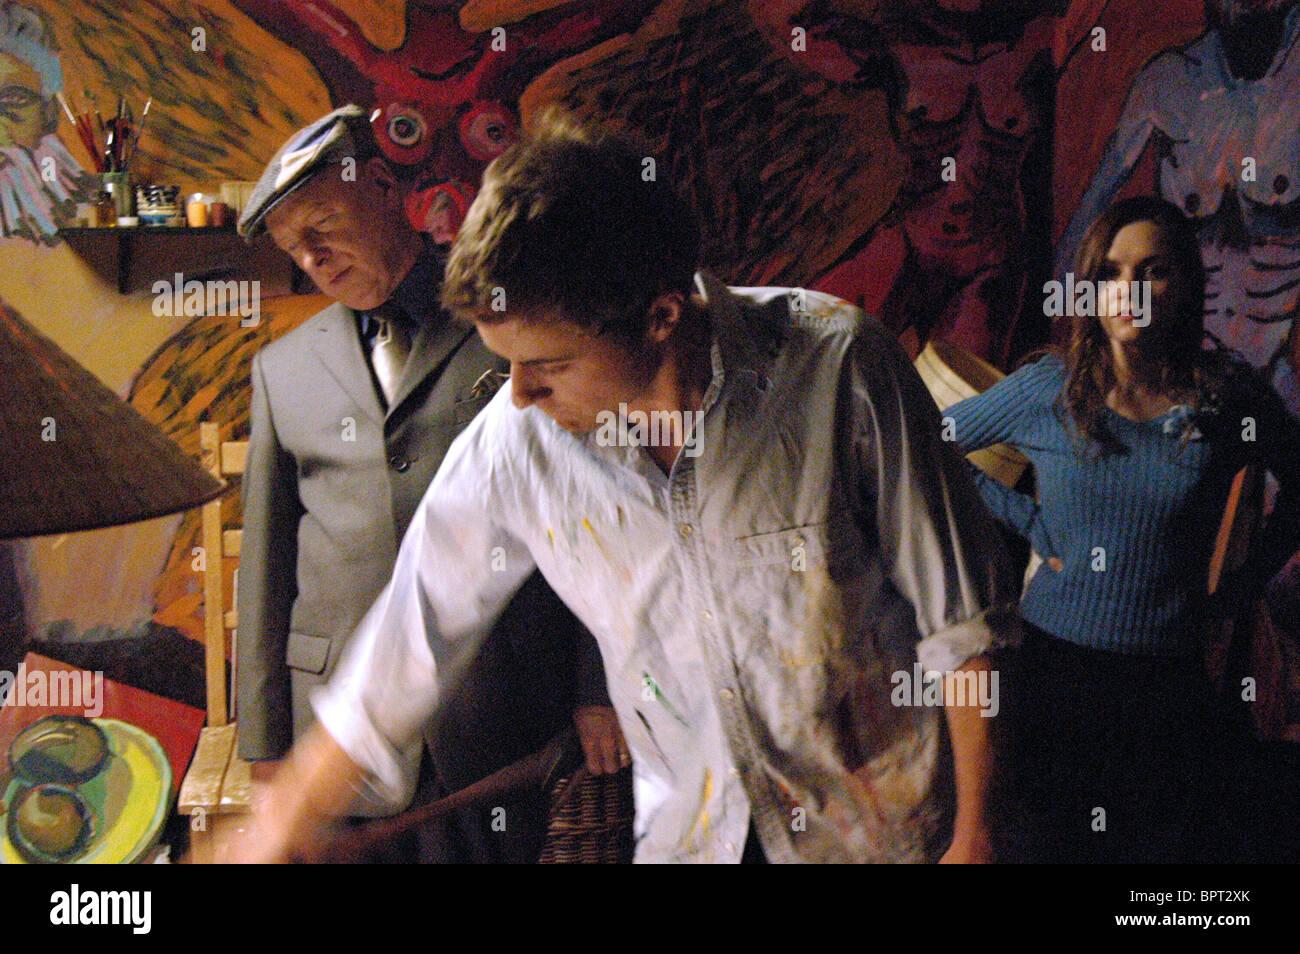 JASON BARRY & PRIMAEXCEL STILLLEBEN; (2007) Stockbild